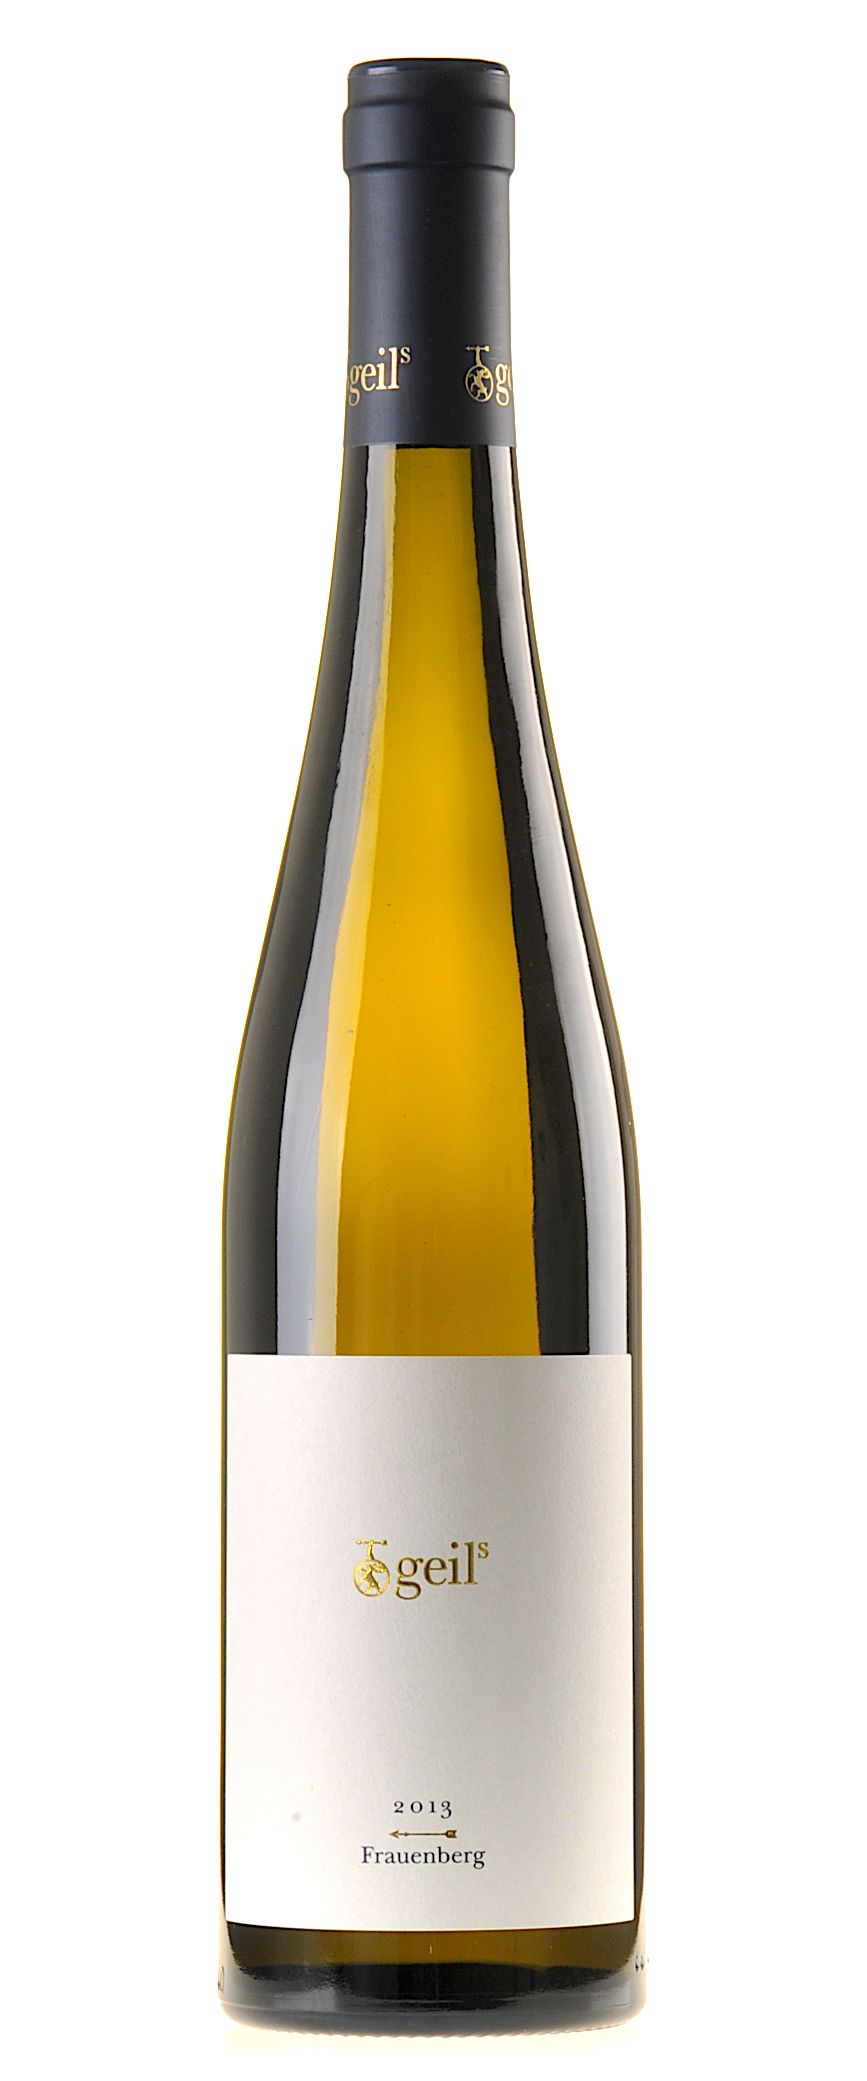 Geils Frauenberg Riesling 2013 Etiquetas De Vino Vino Blanco Y